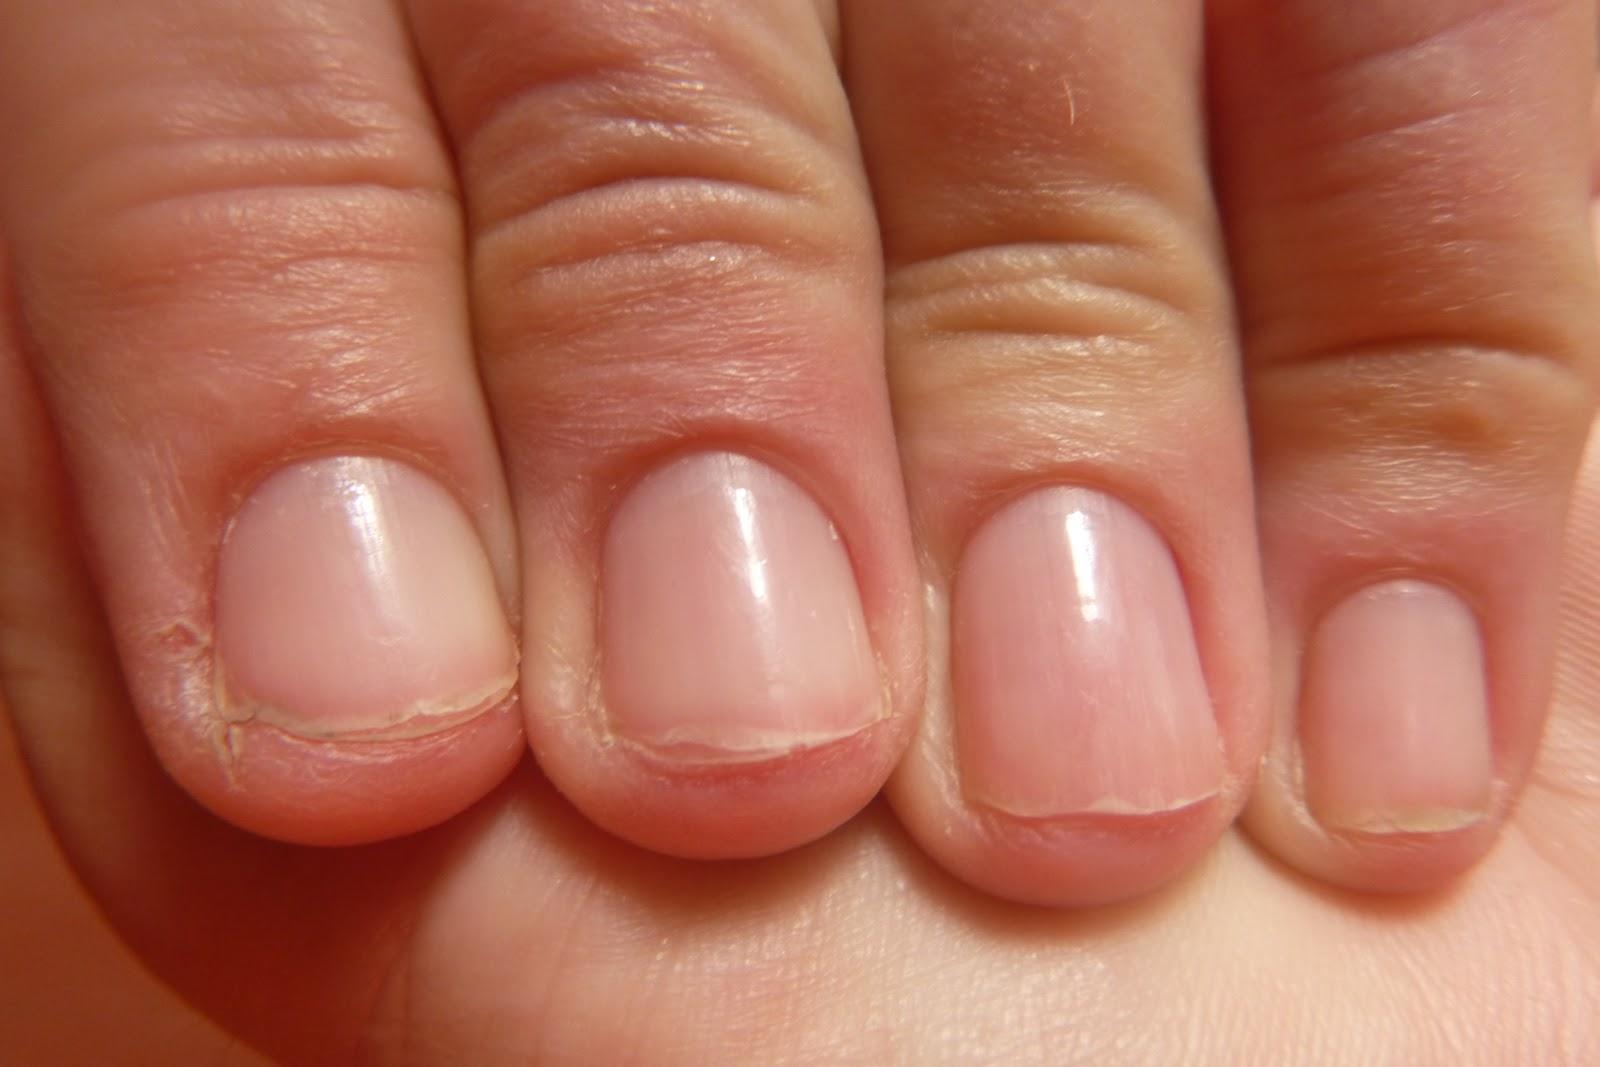 Splitting nails